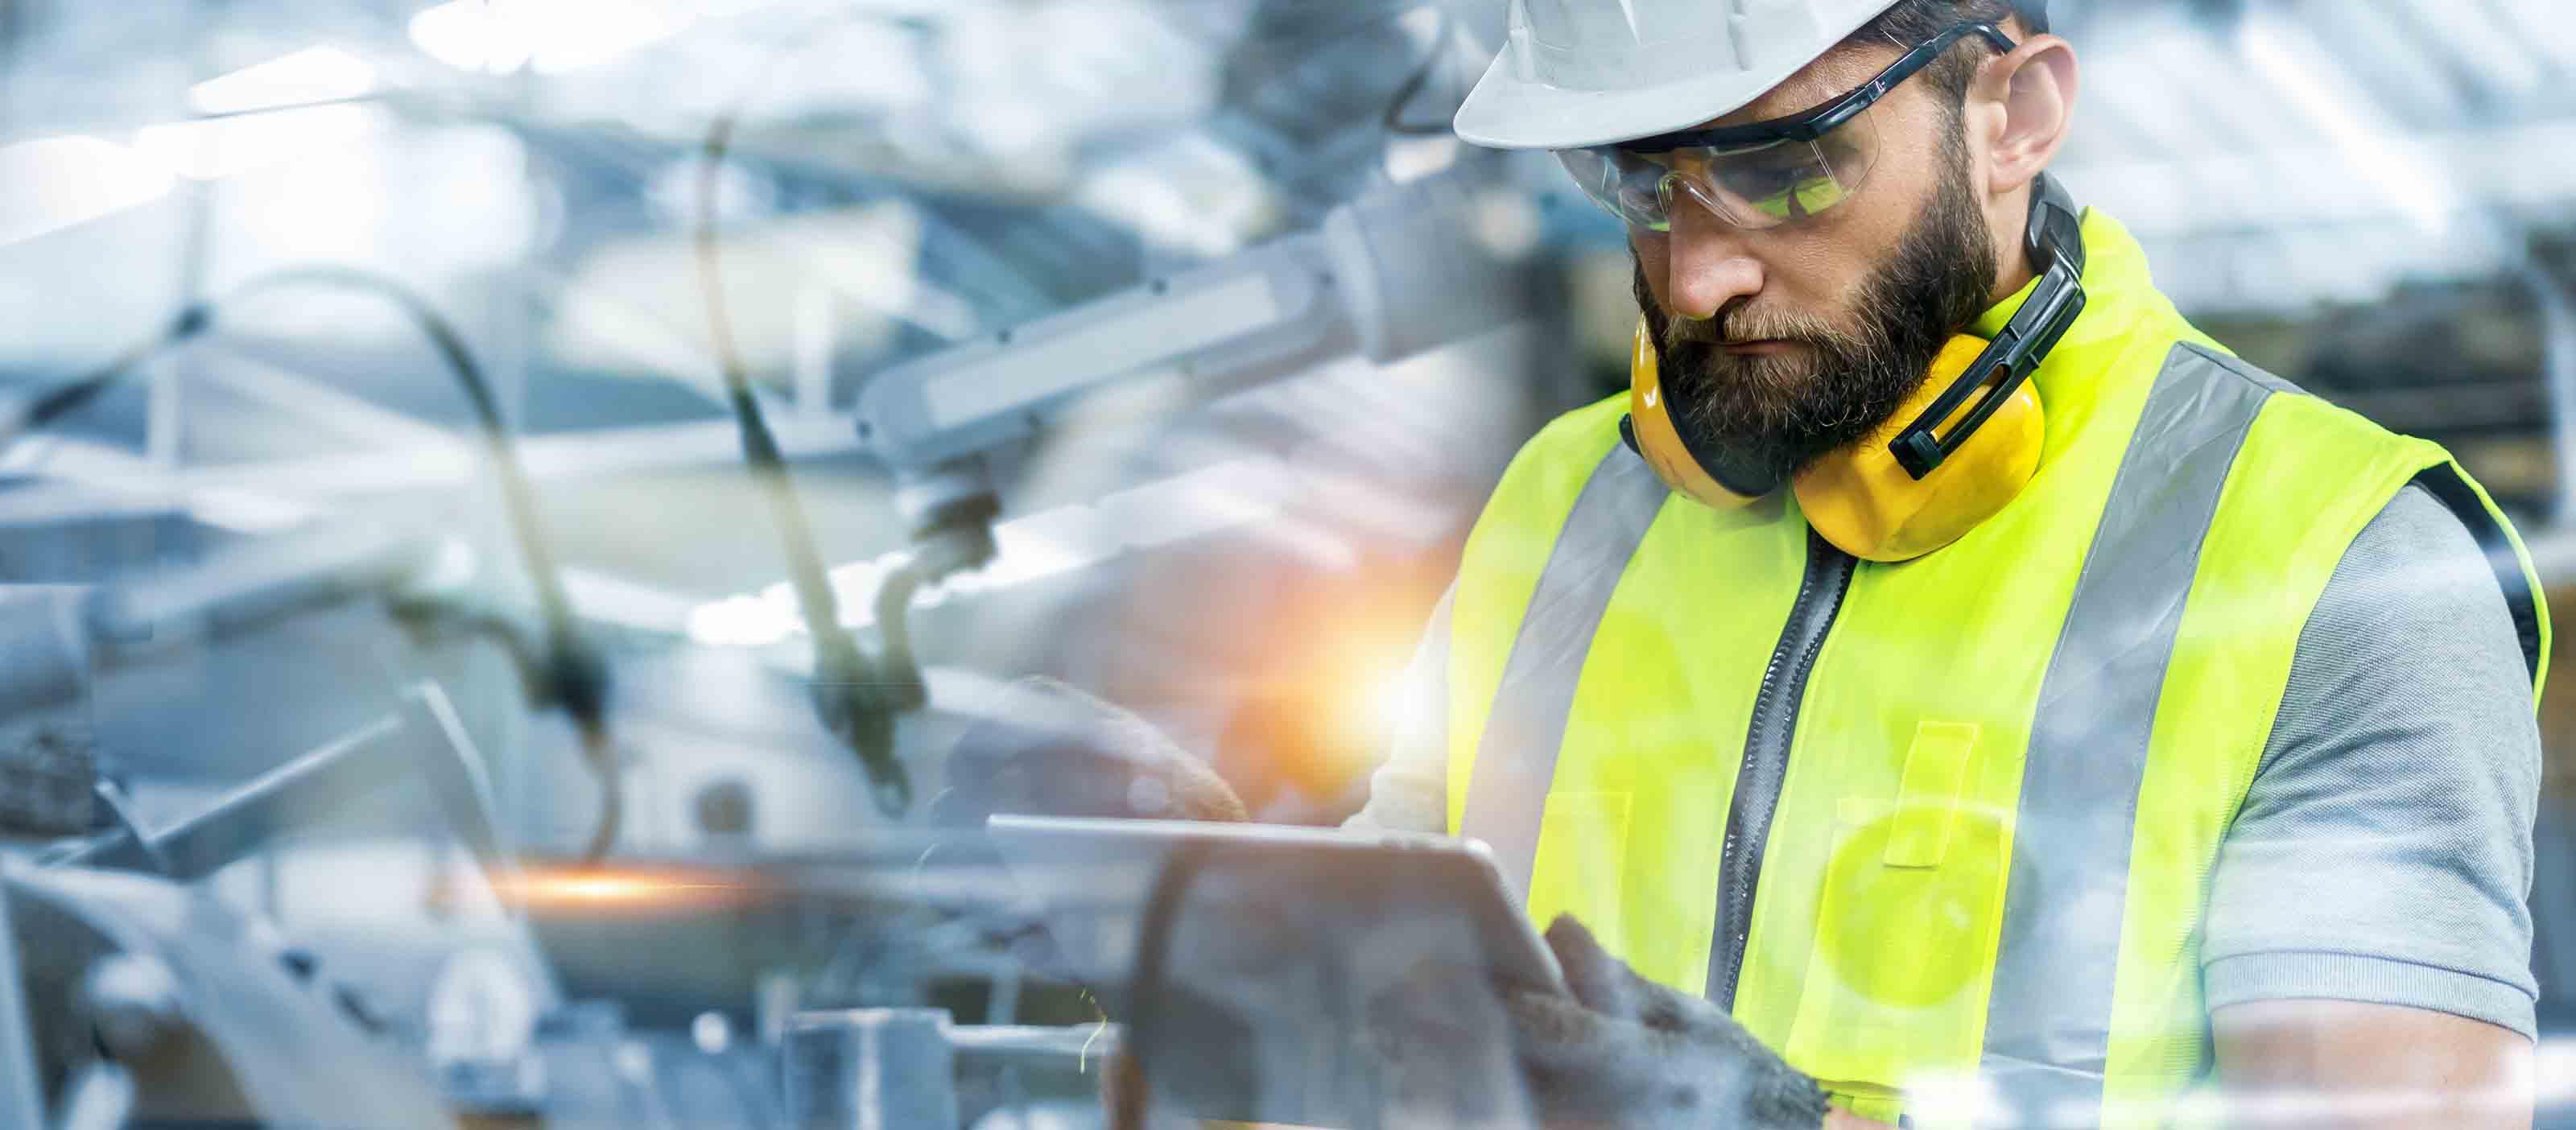 Predictive analytics for preventative maintenance in industrial manufacturing   GE Digital